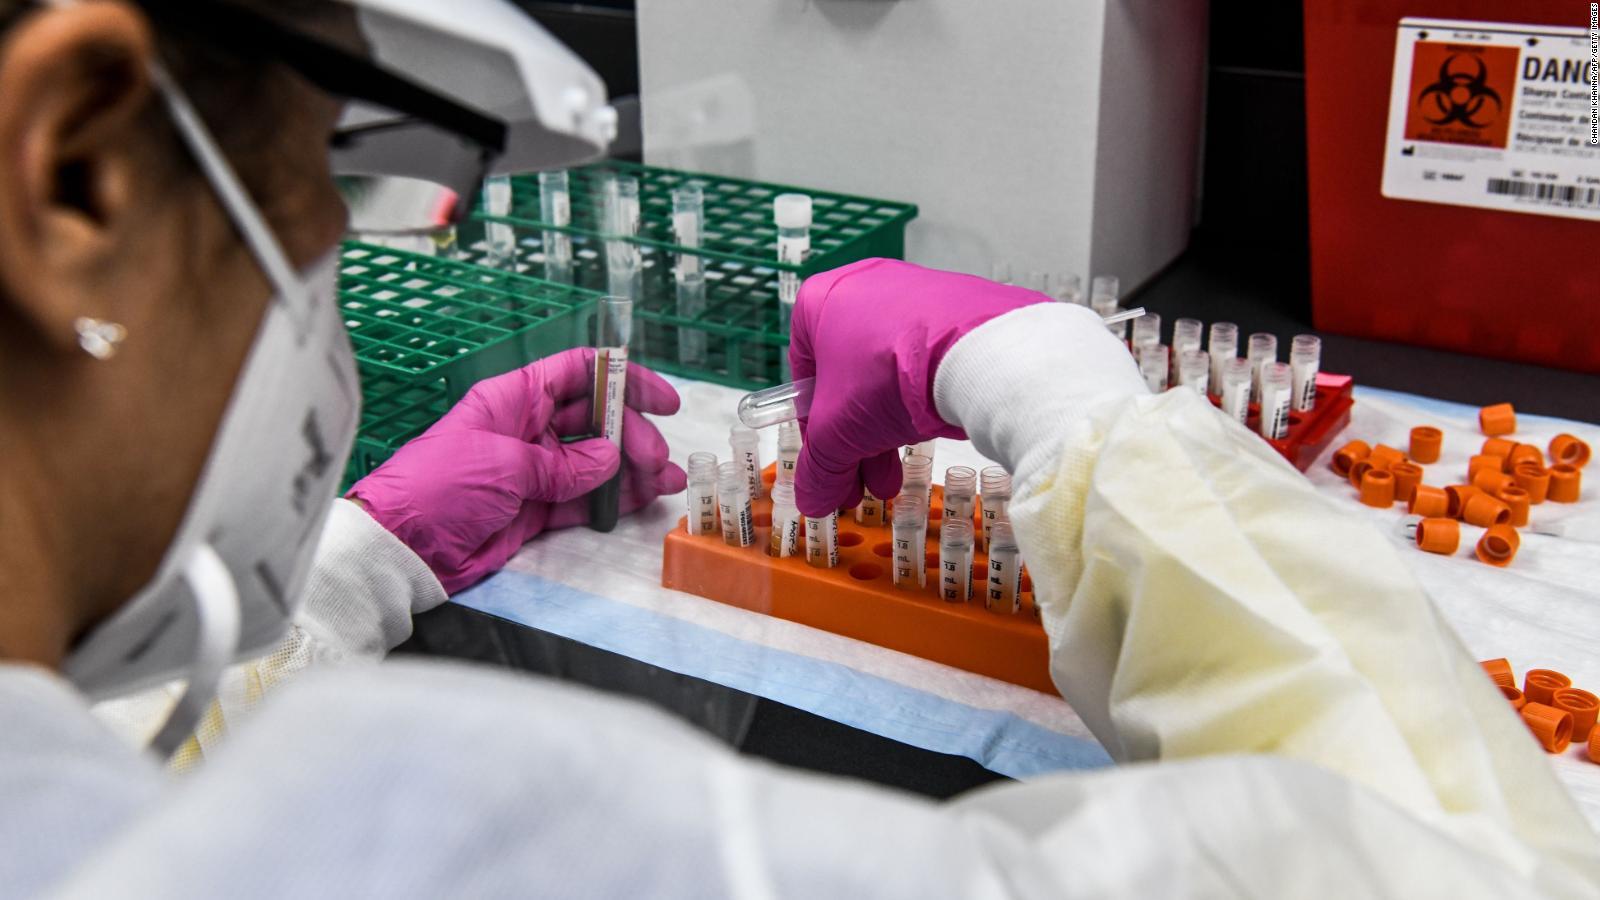 Majority of Americans believe political pressure will cause FDA to rush a  coronavirus vaccine, new poll finds - CNNPolitics